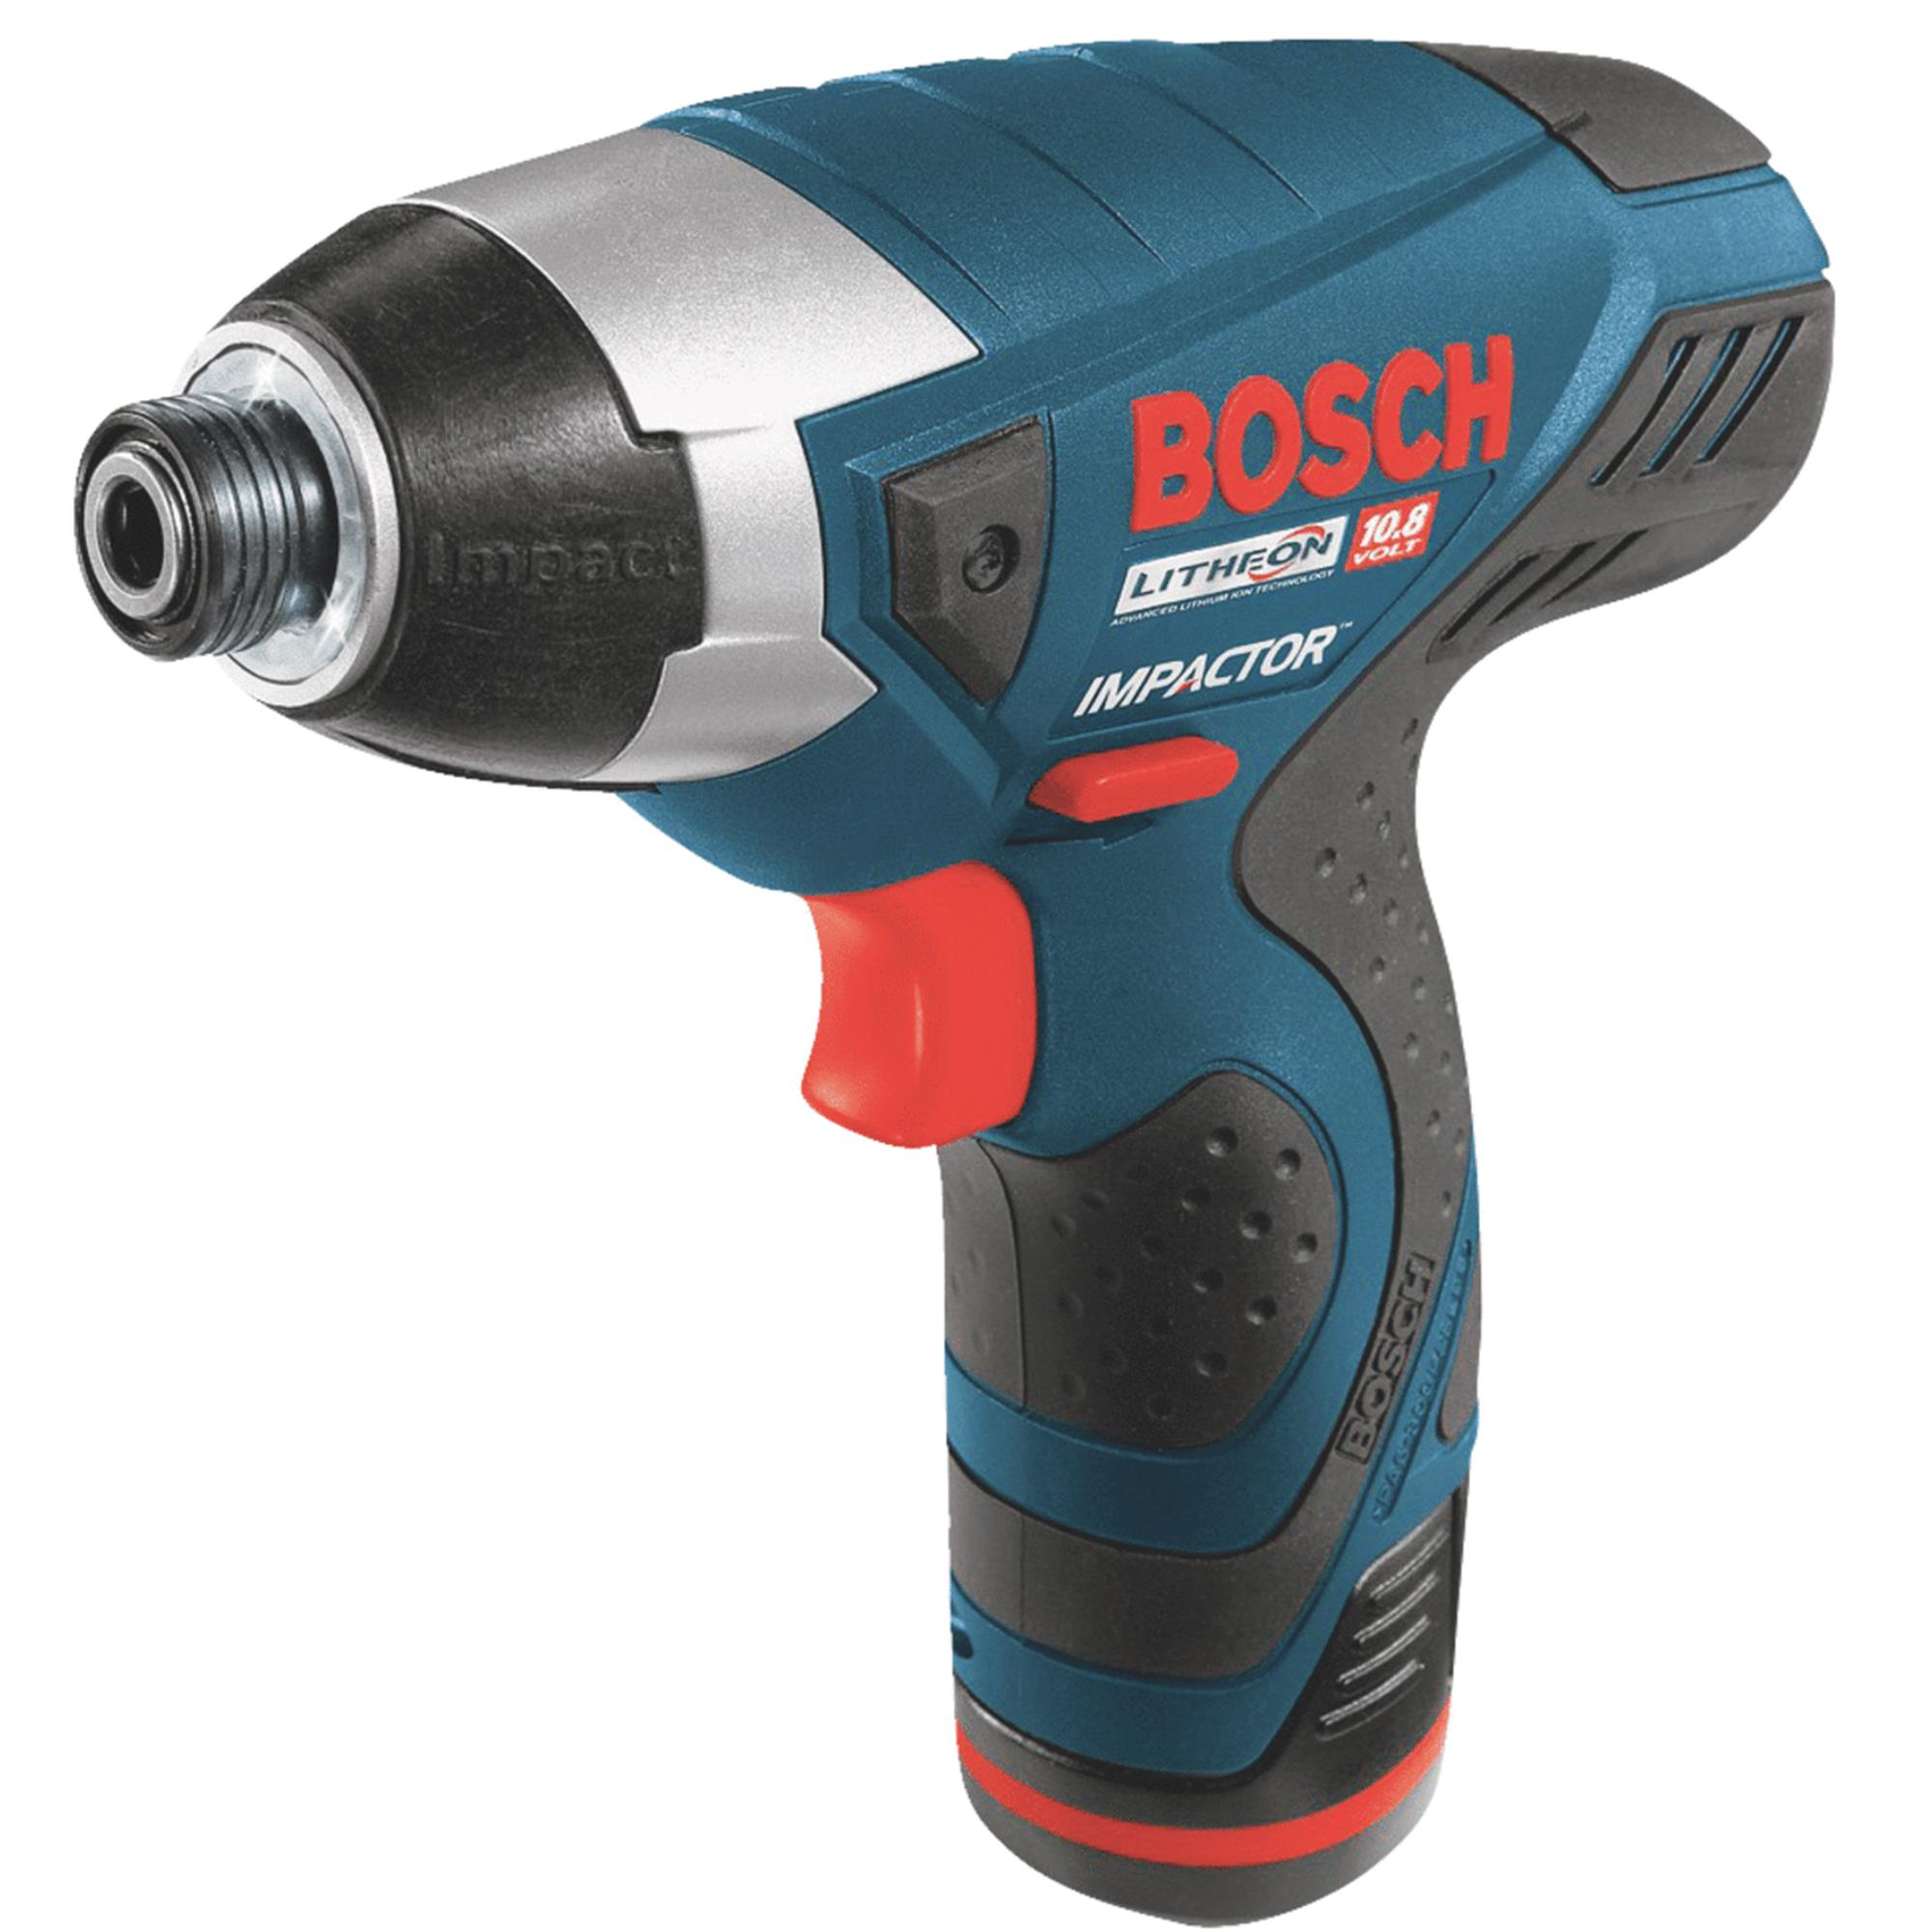 Bosch 12V Max Lithium-Ion Cordless Impact Driver Kit